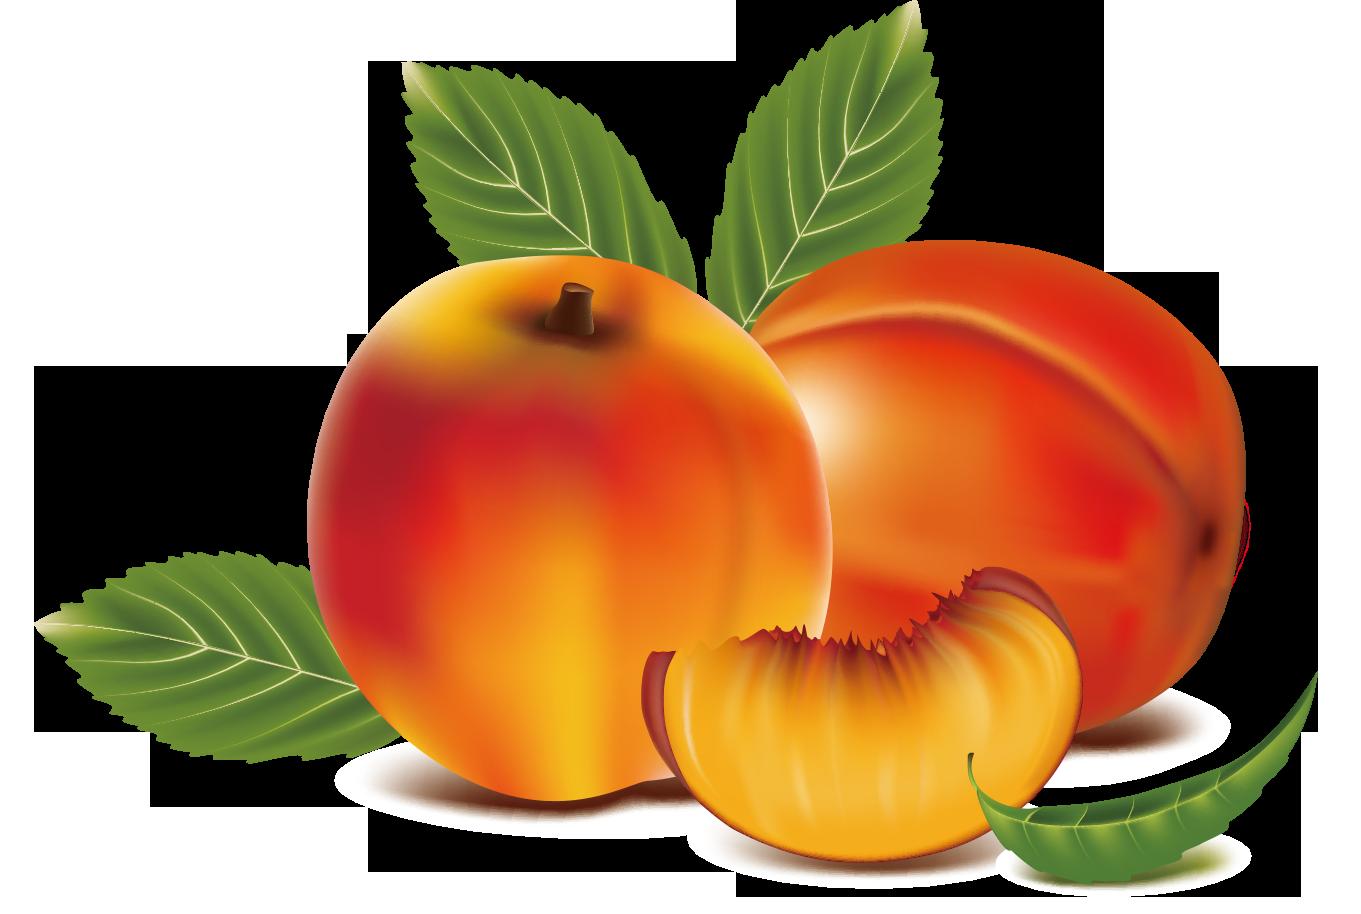 image library stock Peach fruit clip art. Peaches clipart orange food.